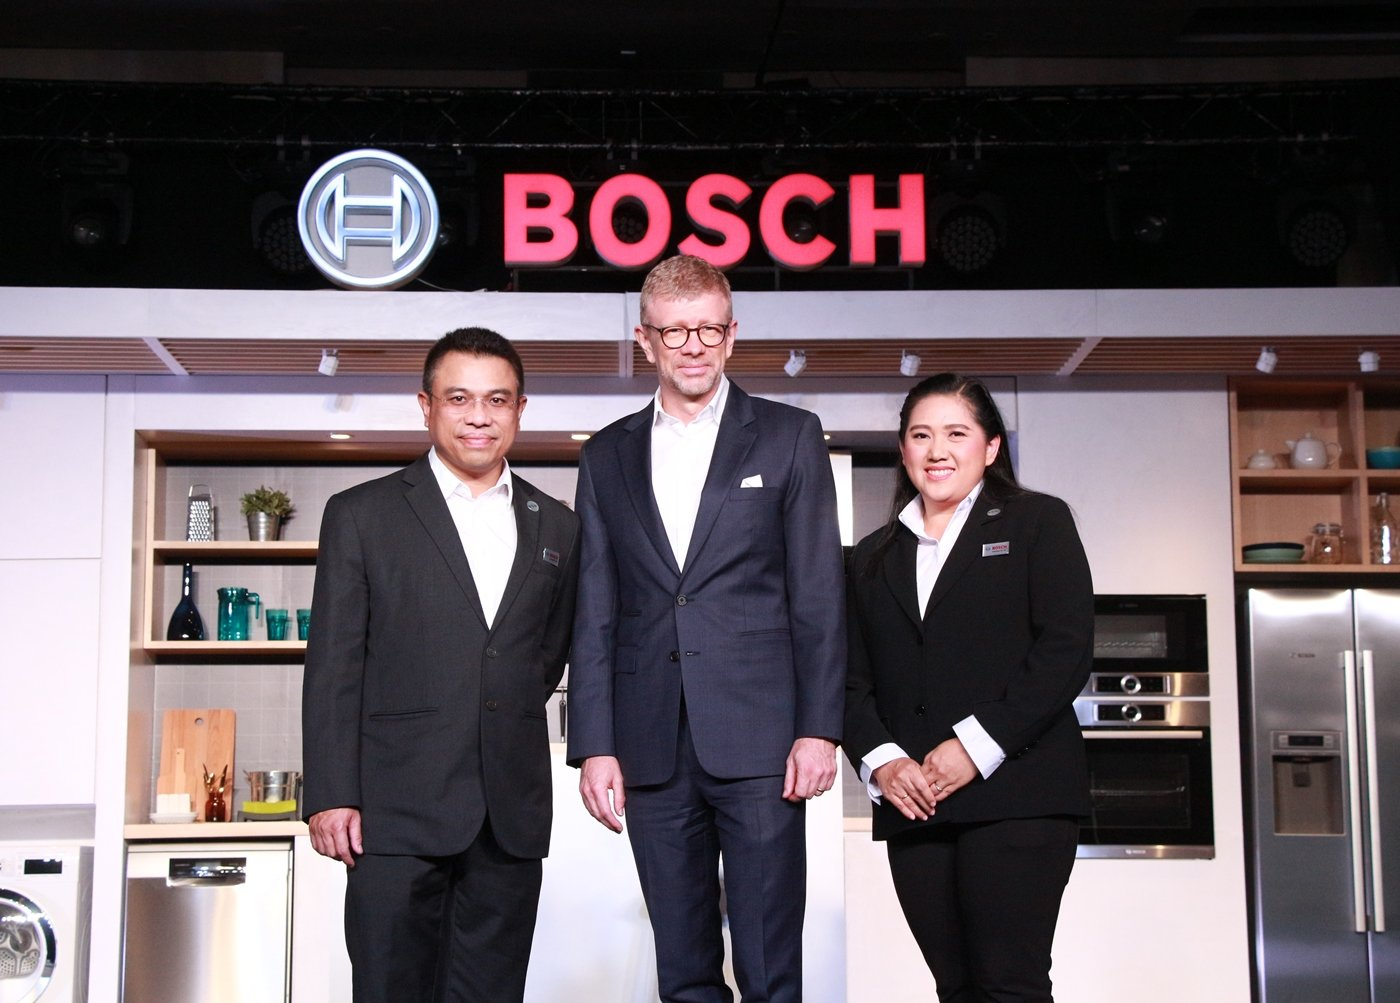 BSH เปิดตัว BOSCH แบรนด์เครื่องใช้ไฟฟ้าอันดับ 1 ในยุโรป ชูนวัตกรรมโดดเด่นพร้อมรุกตลาดพรีเมี่ยมในประเทศไทย